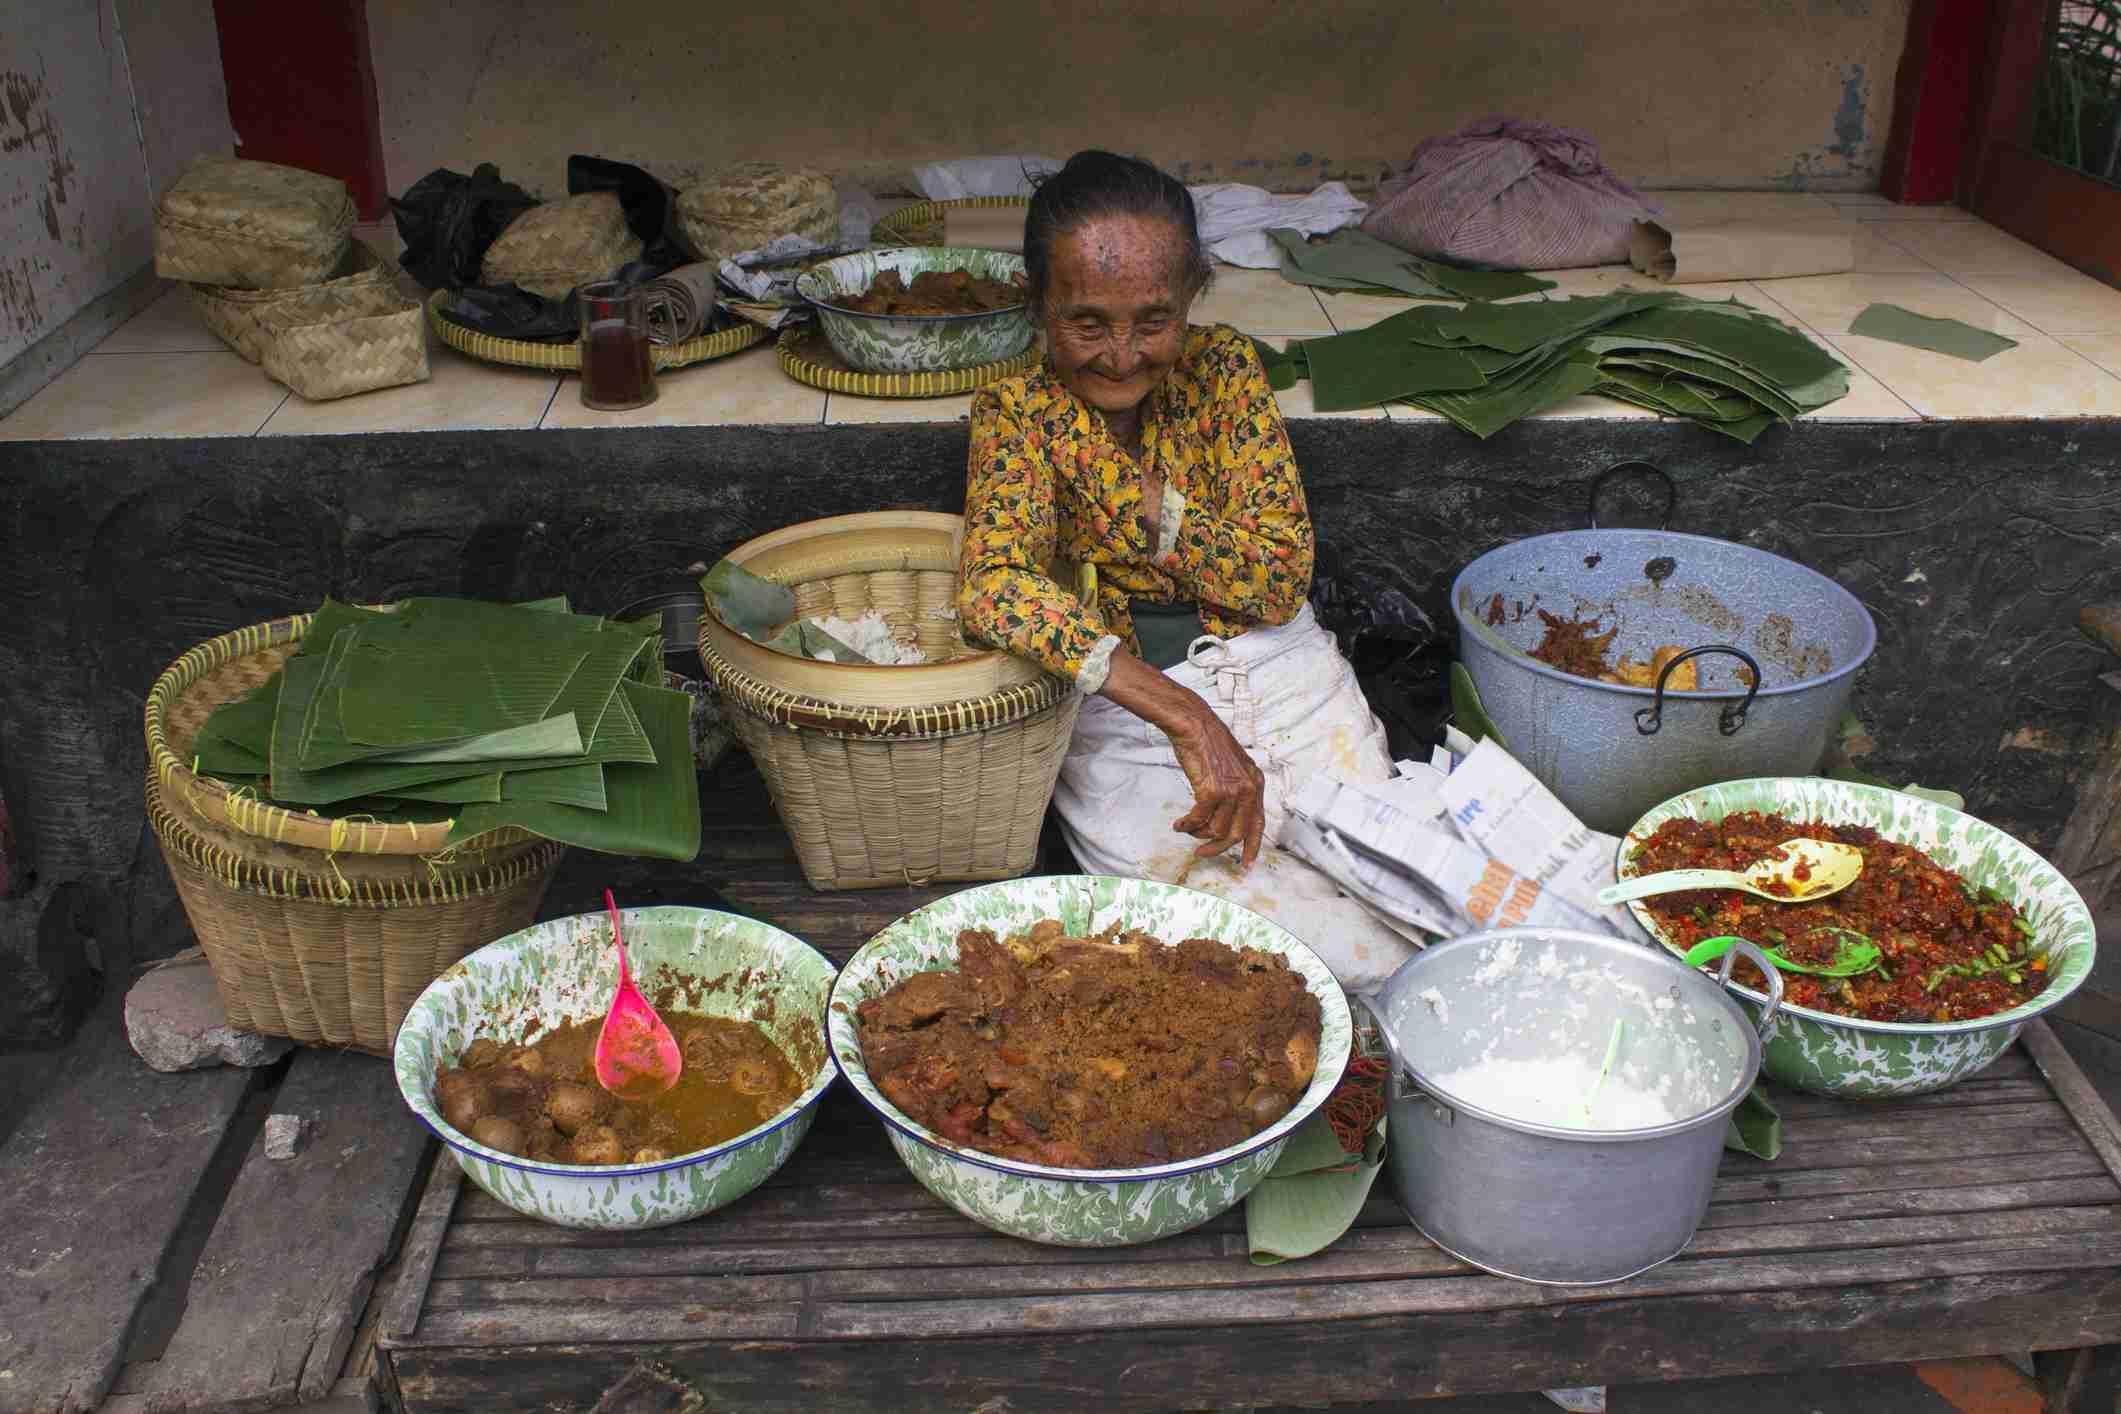 Gudeg seller in Yogyakarta, Indonesia